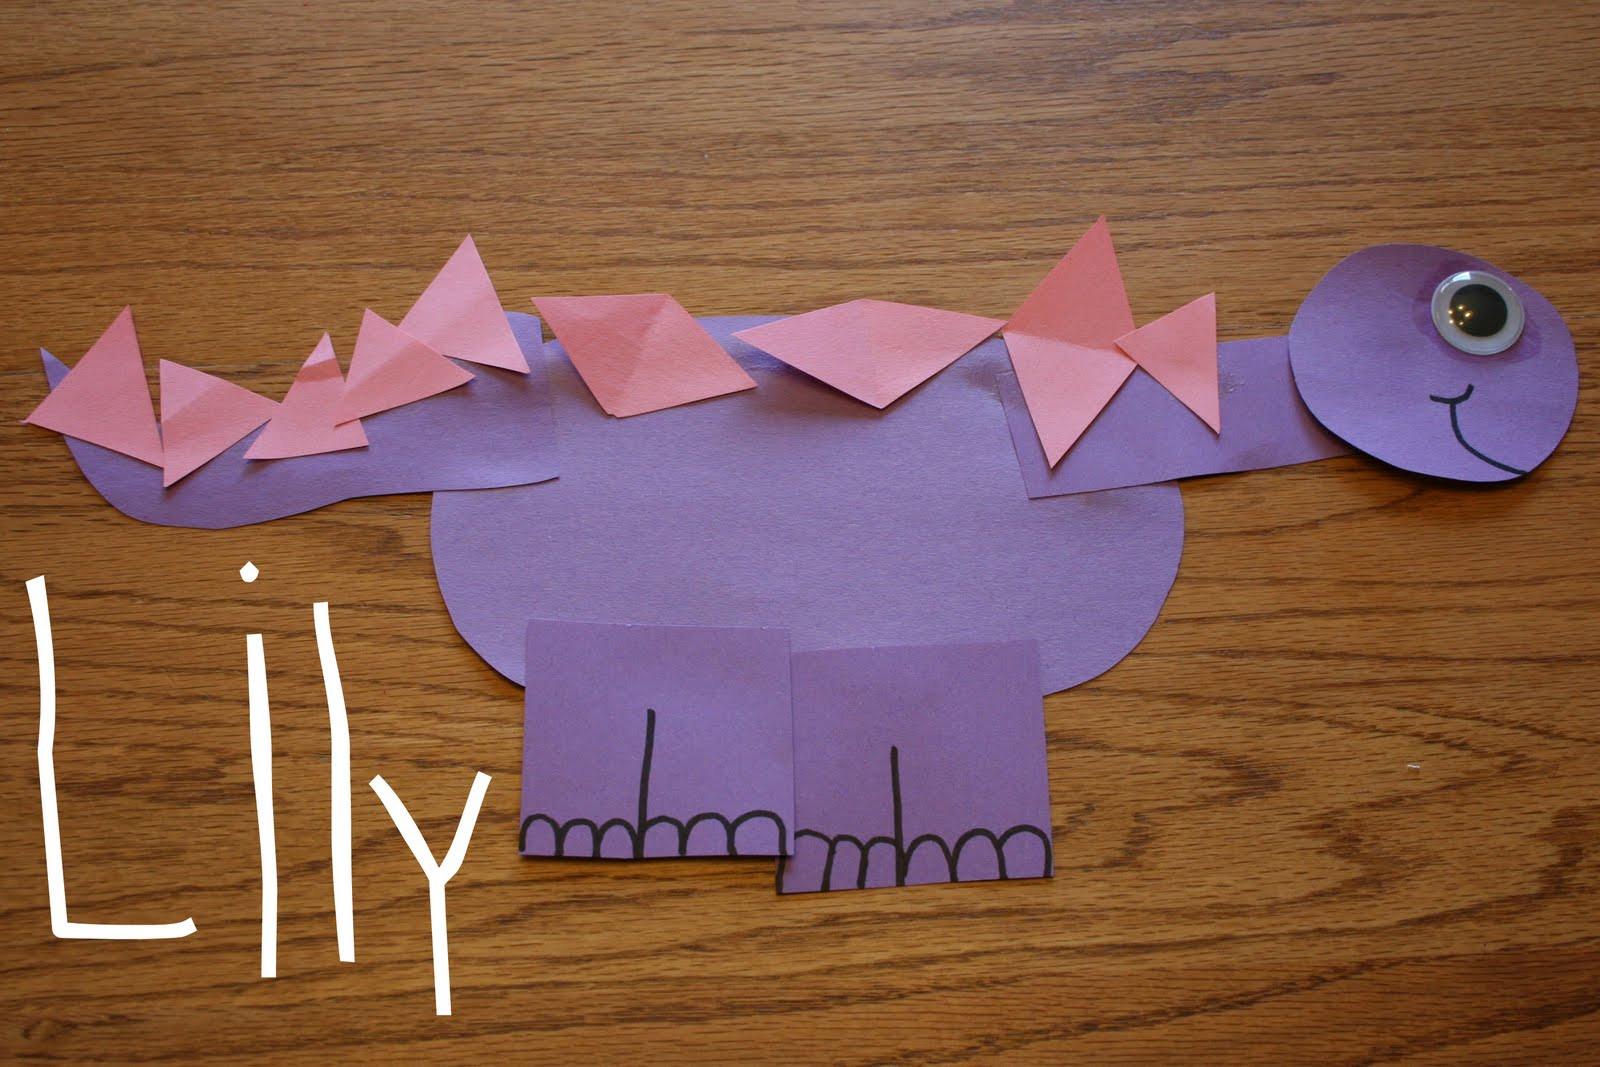 Best ideas about Preschool Art Projects . Save or Pin The Logan s Preschool Art Projects Now.